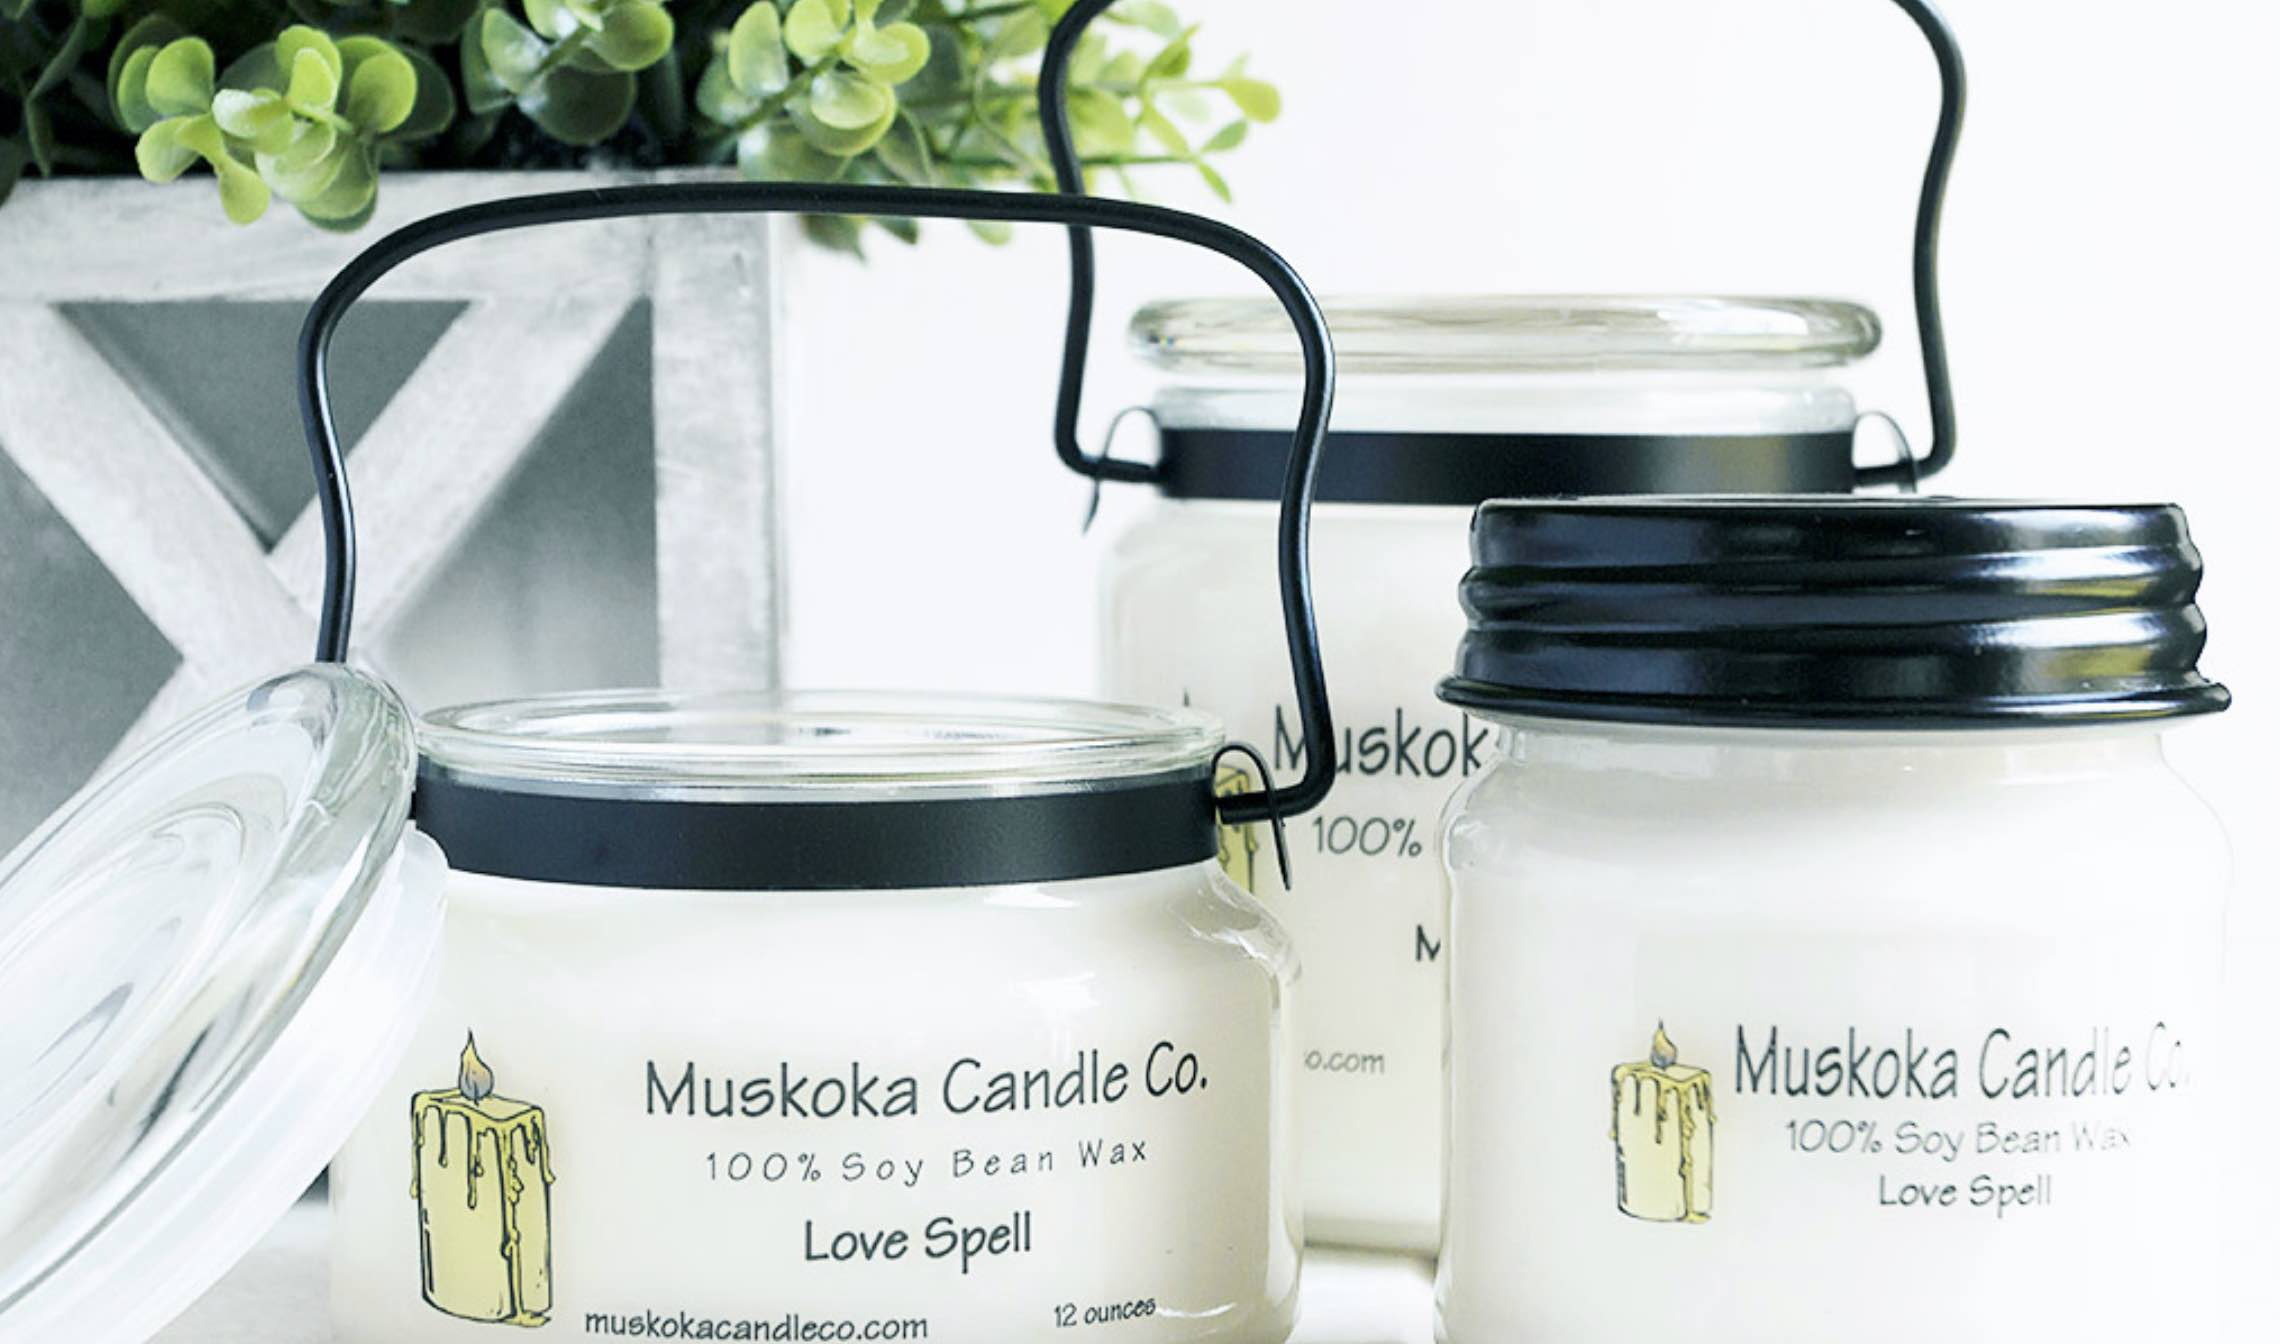 Muskoka Candle Co souvenir shopping in Muskoka candle display